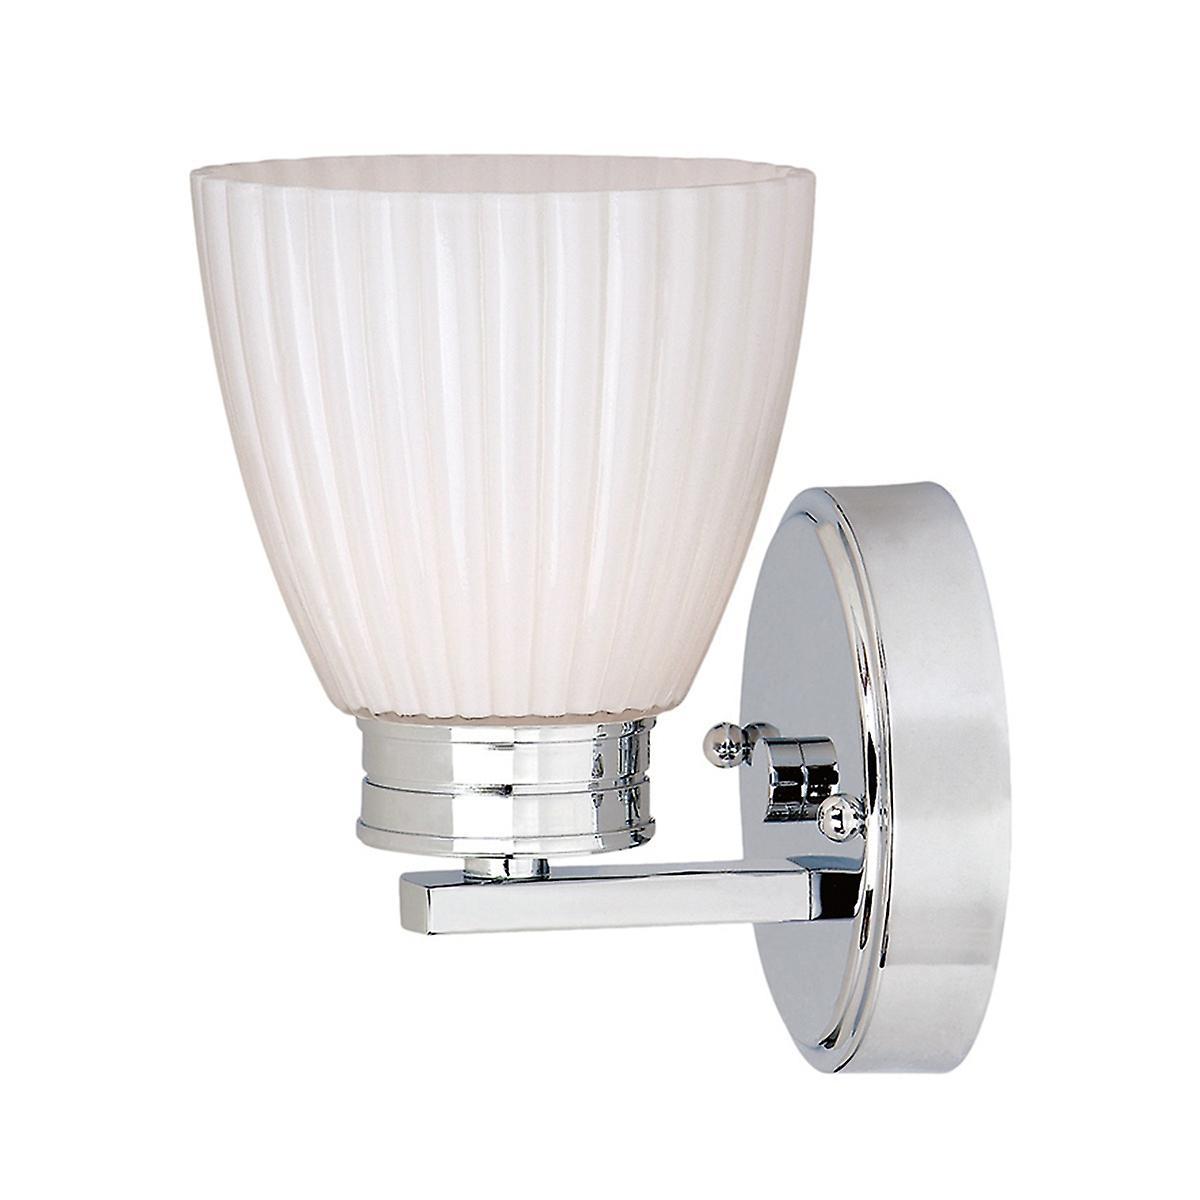 Elstead BATH/WL1 Wallingford Modern Single Bathroom Wall Light with White Glass